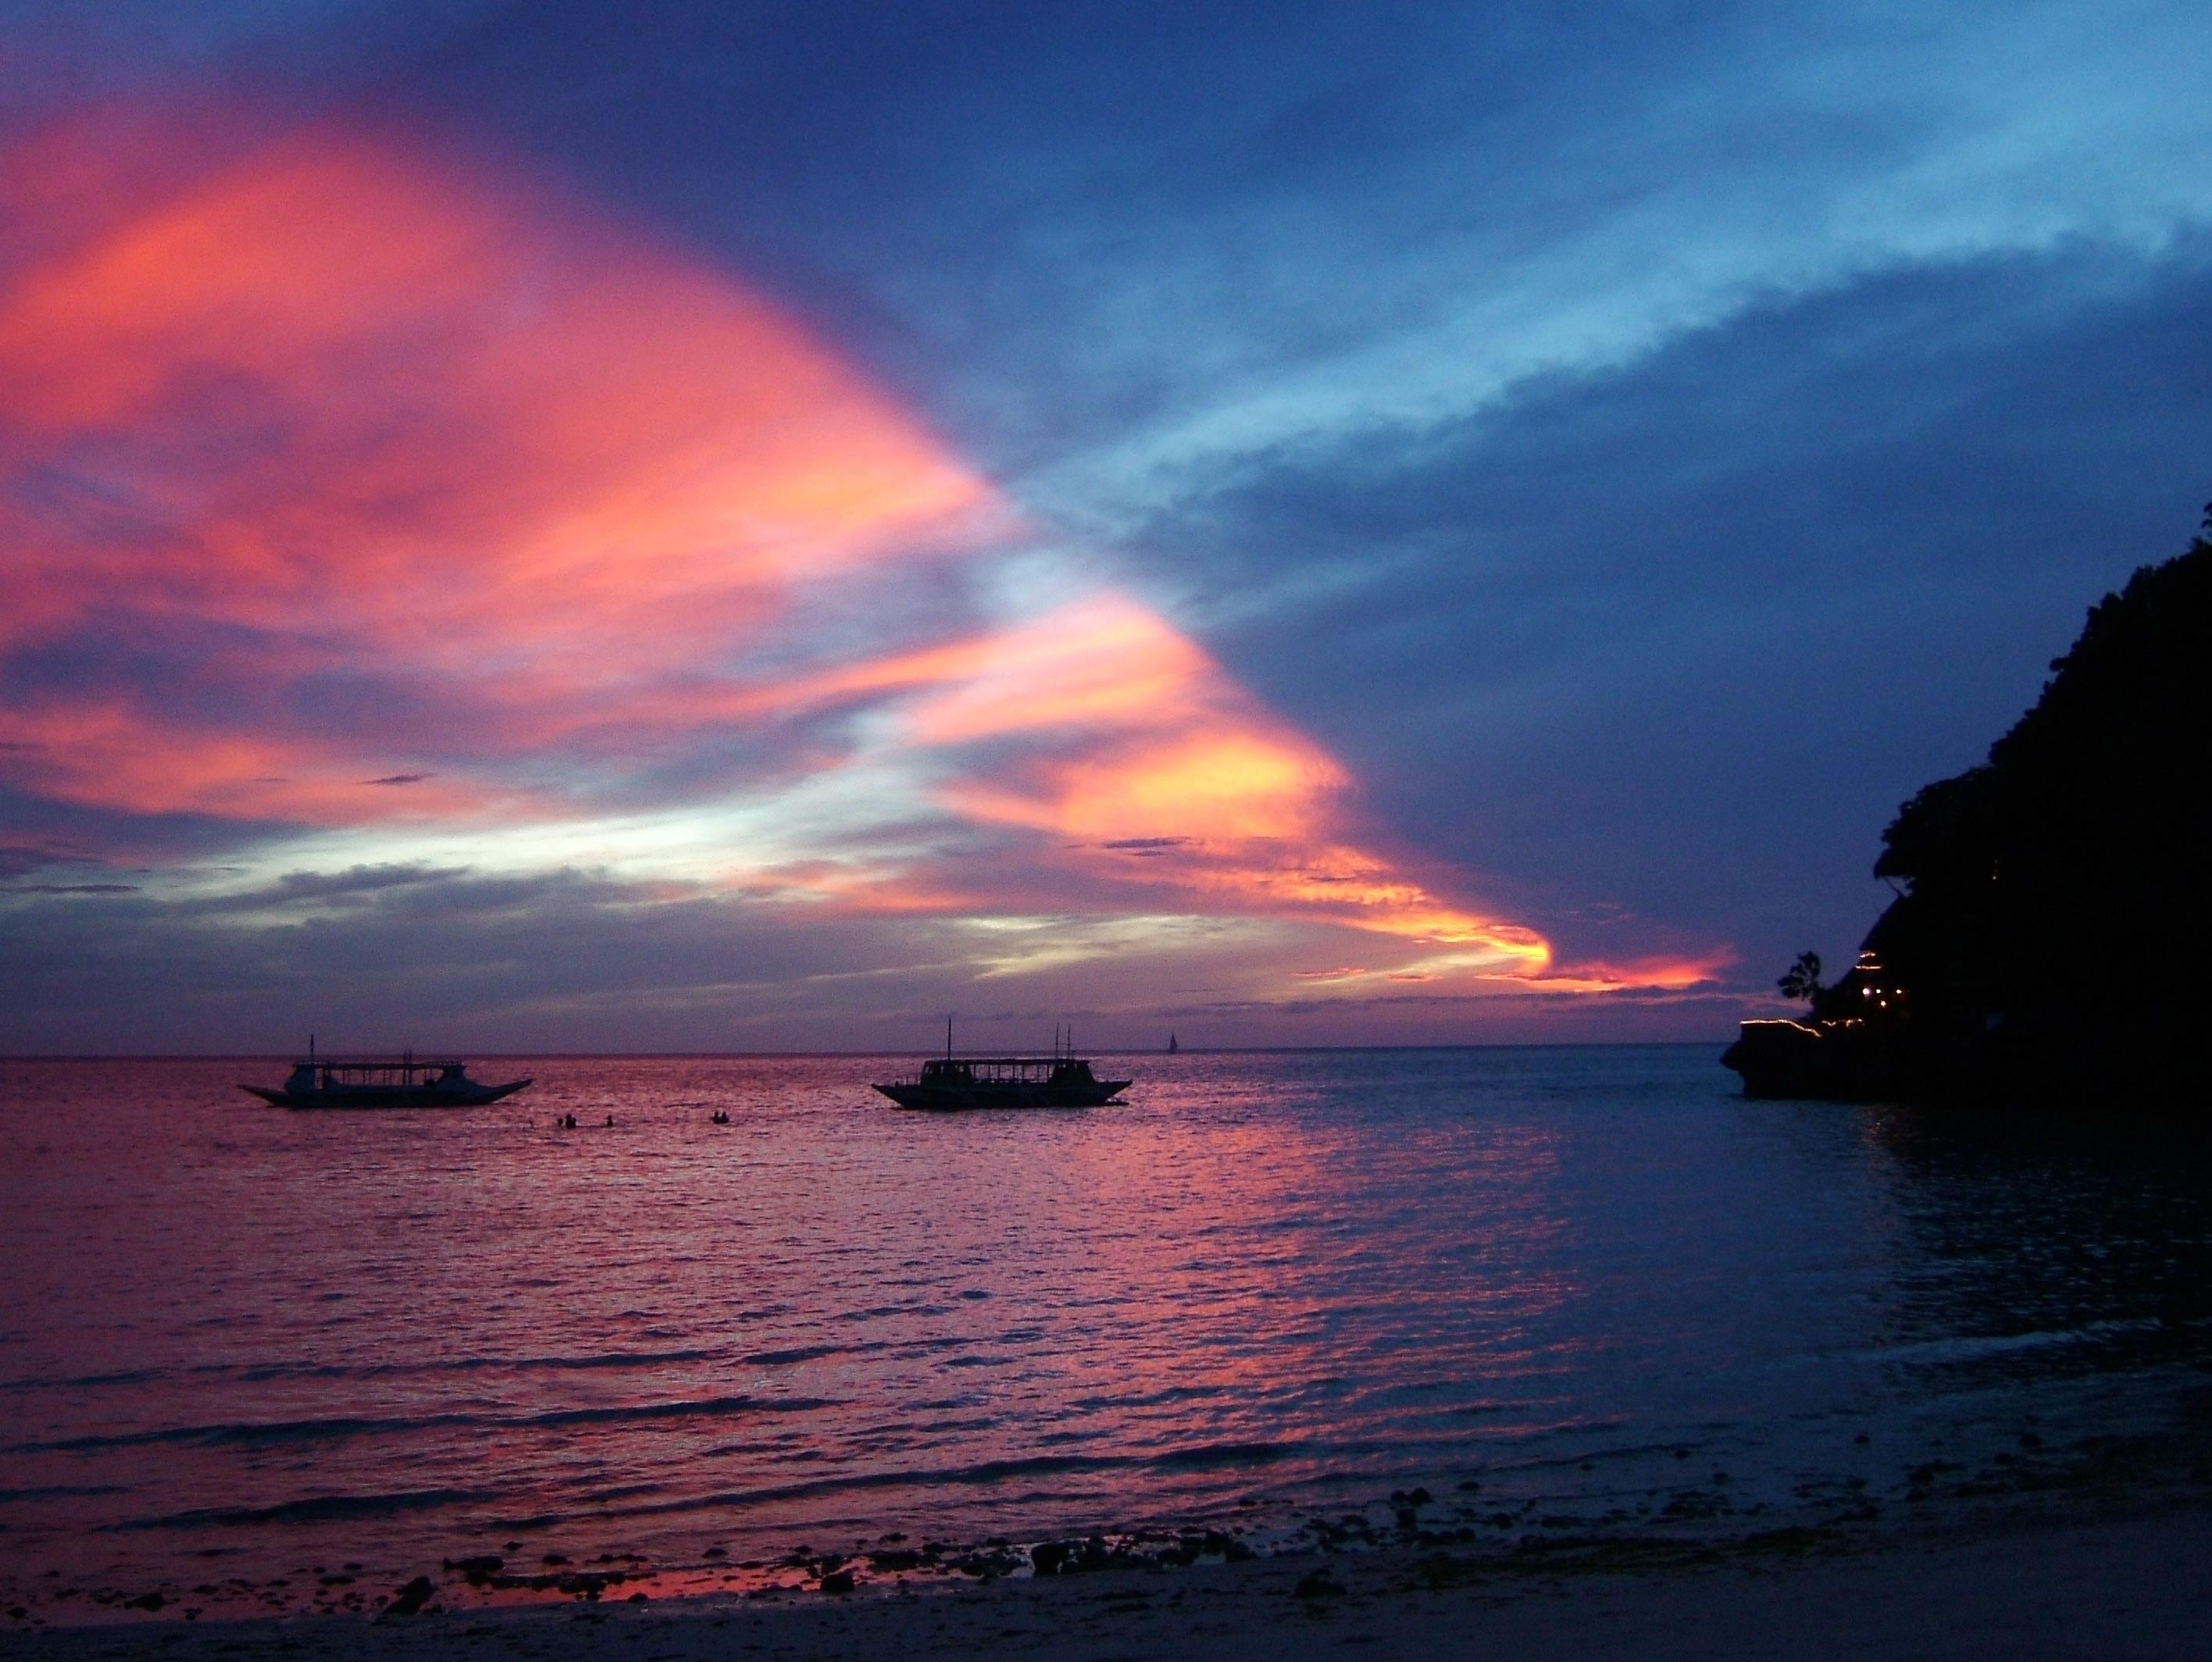 Philippines Sugar Islands Caticlan Boracay White Beach Sunset 2007 54